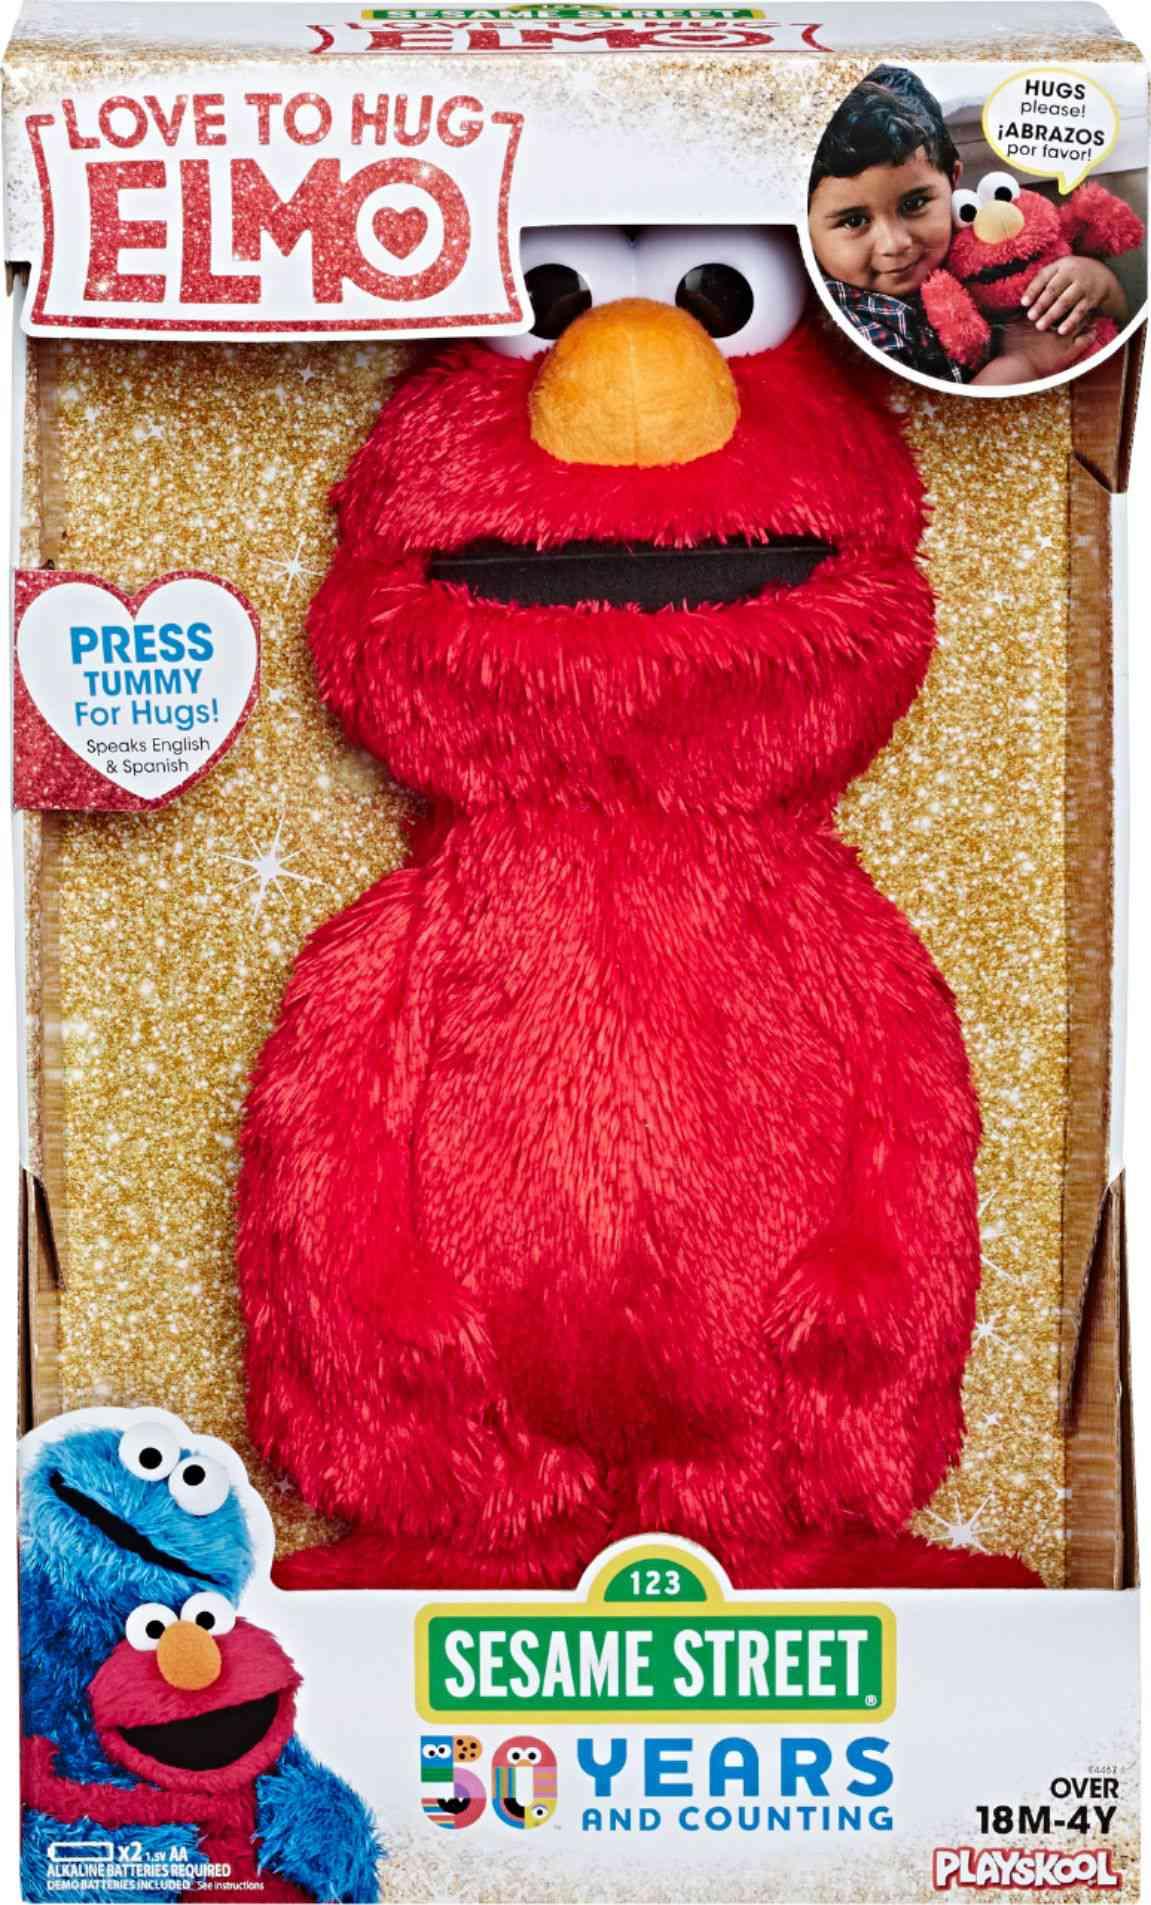 Sesame Street Love to Hug Elmo Plush Toy